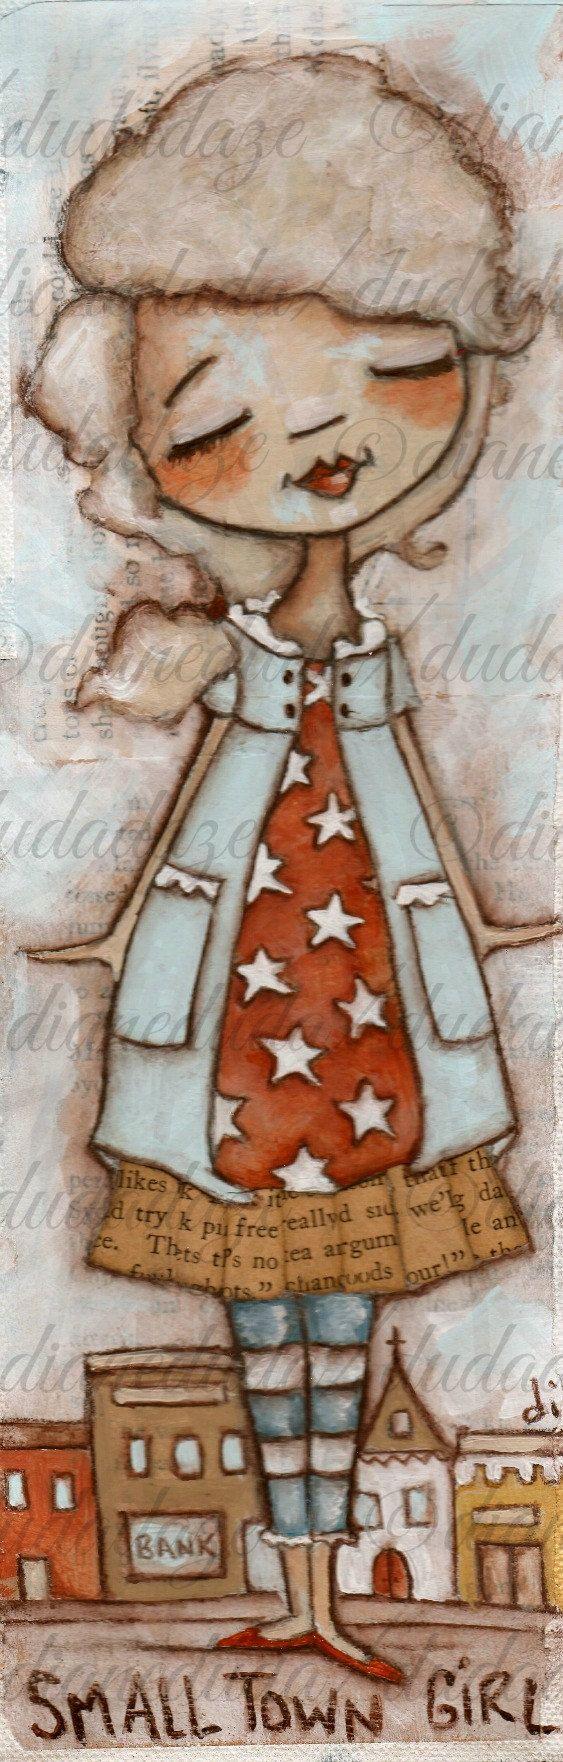 Original Folk Art Mixed Media Painting  Small Town Girl by DUDADAZE, $65.00 ©dianeduda/dudadaze